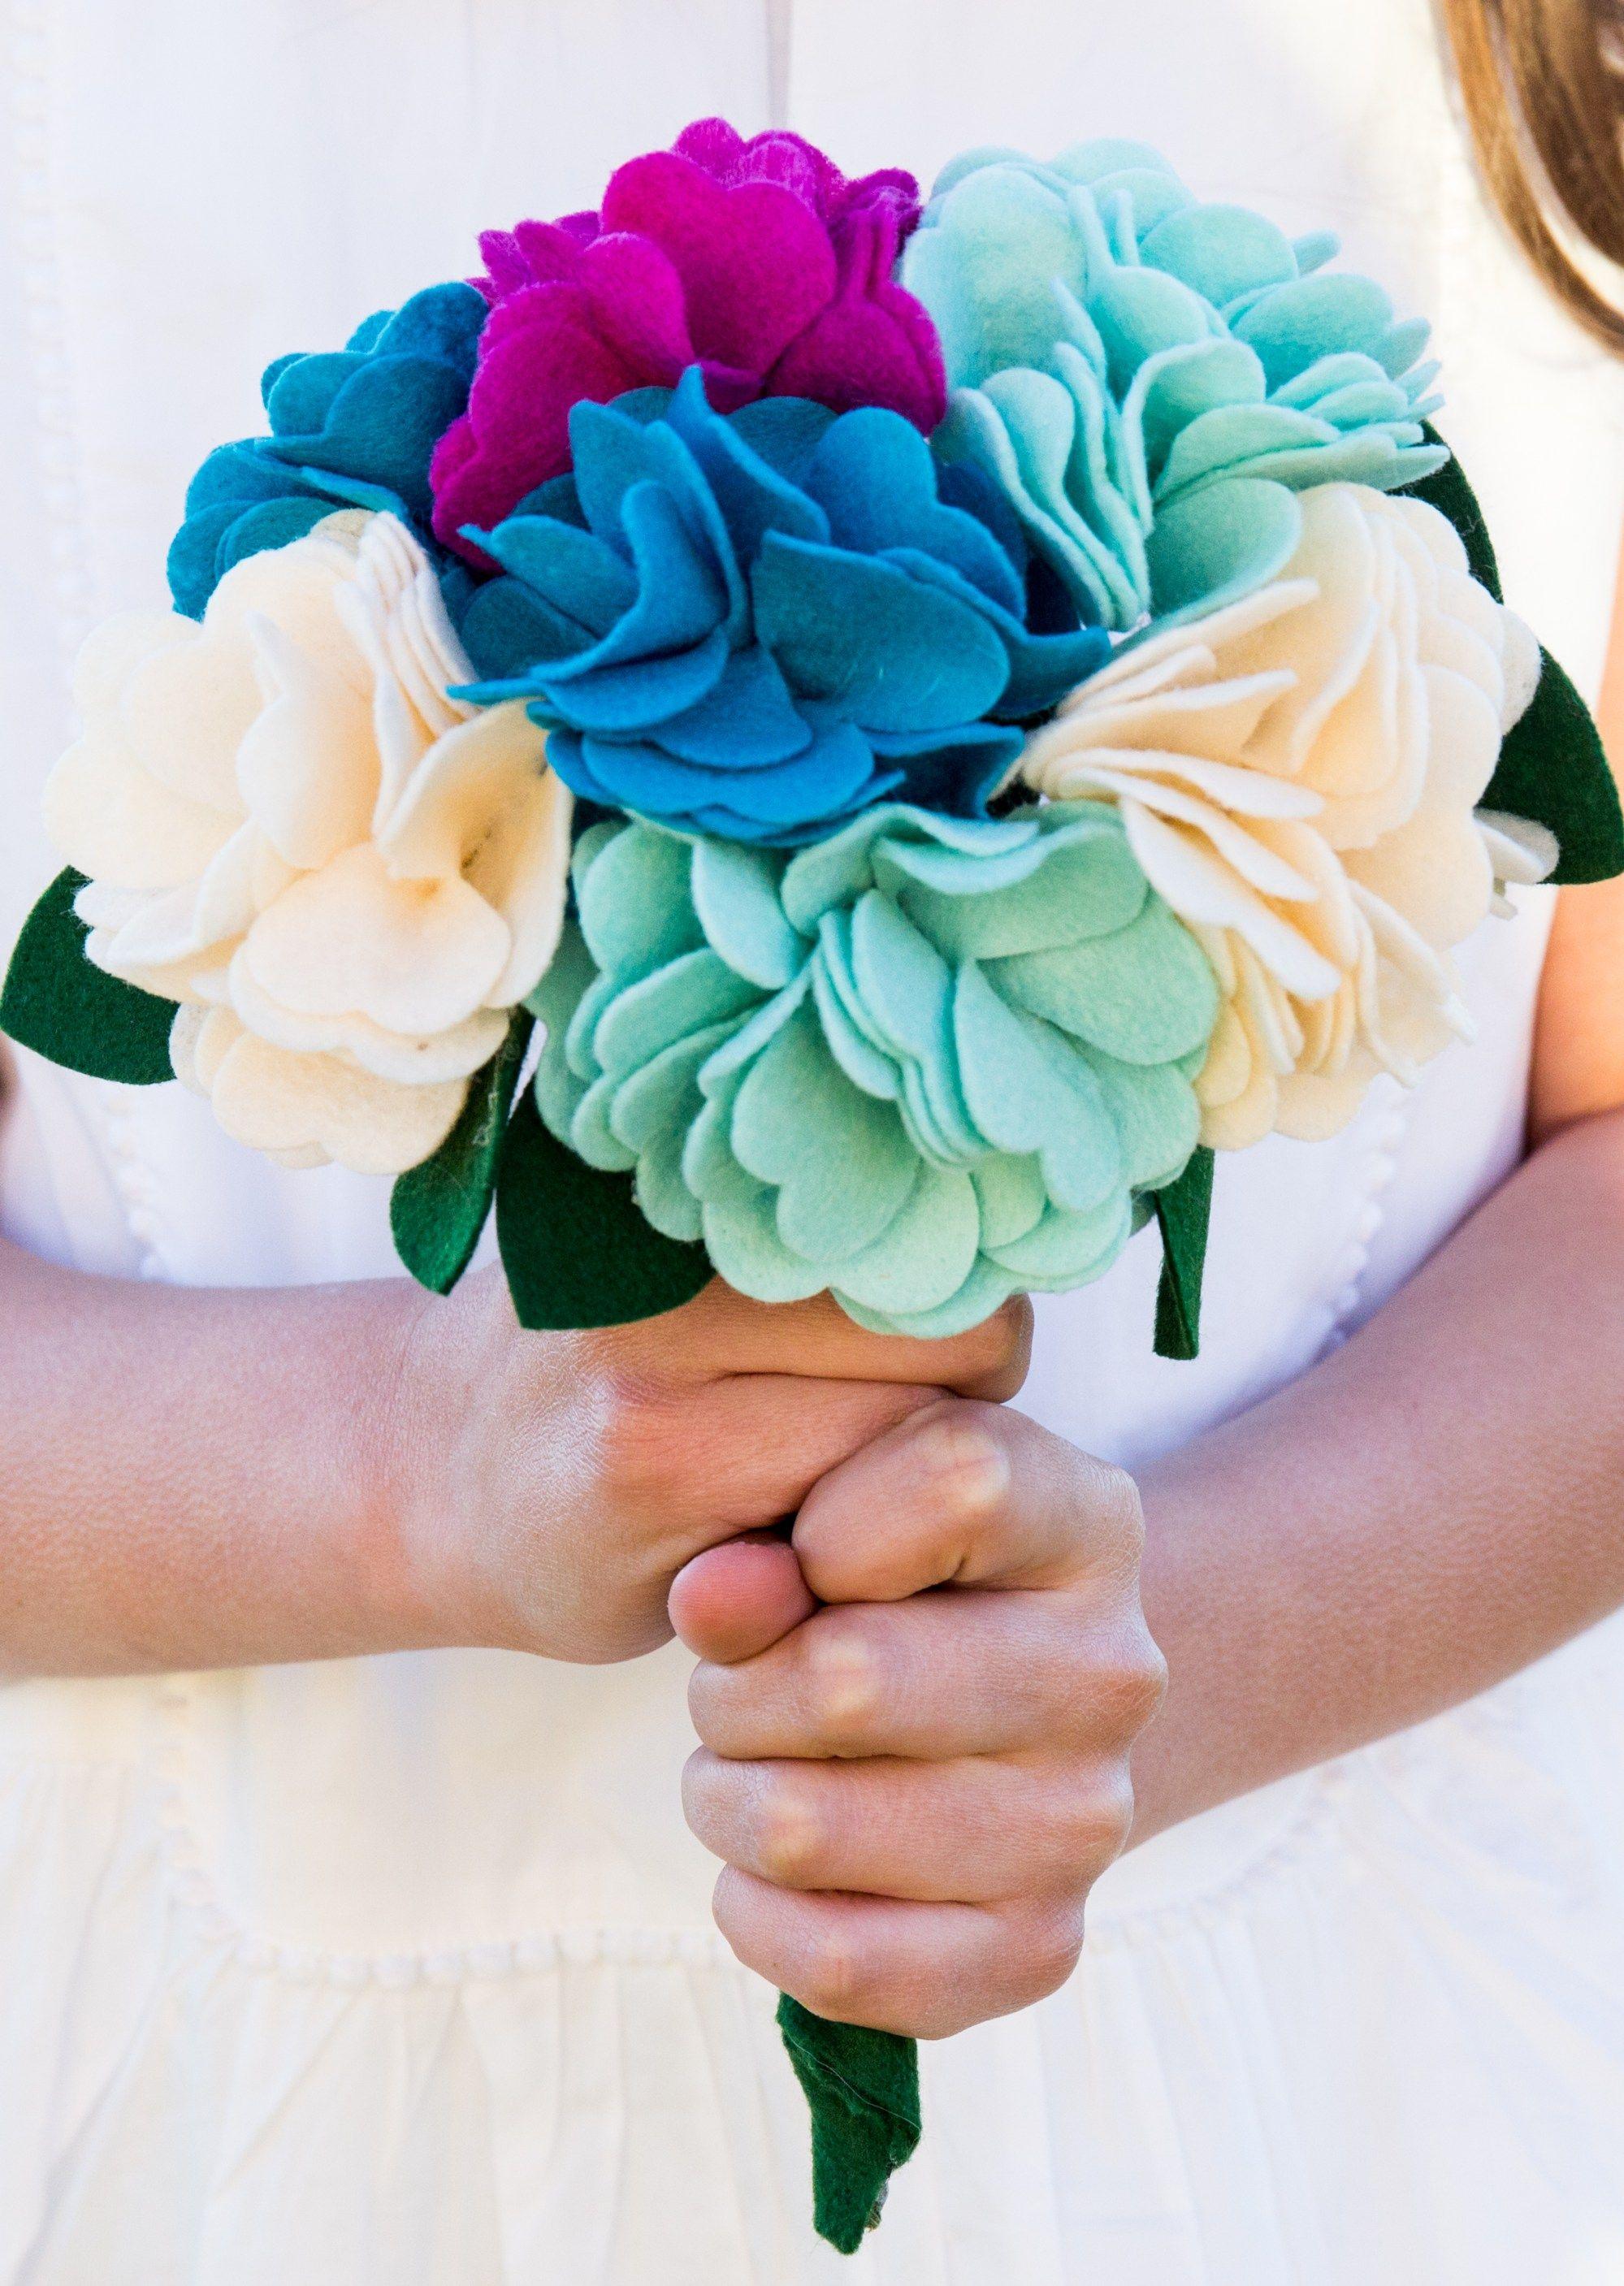 Diy felt flower bouquet tutorial flower crafts flower bouquets diy felt flower bouquet tutorial simple simon and company izmirmasajfo